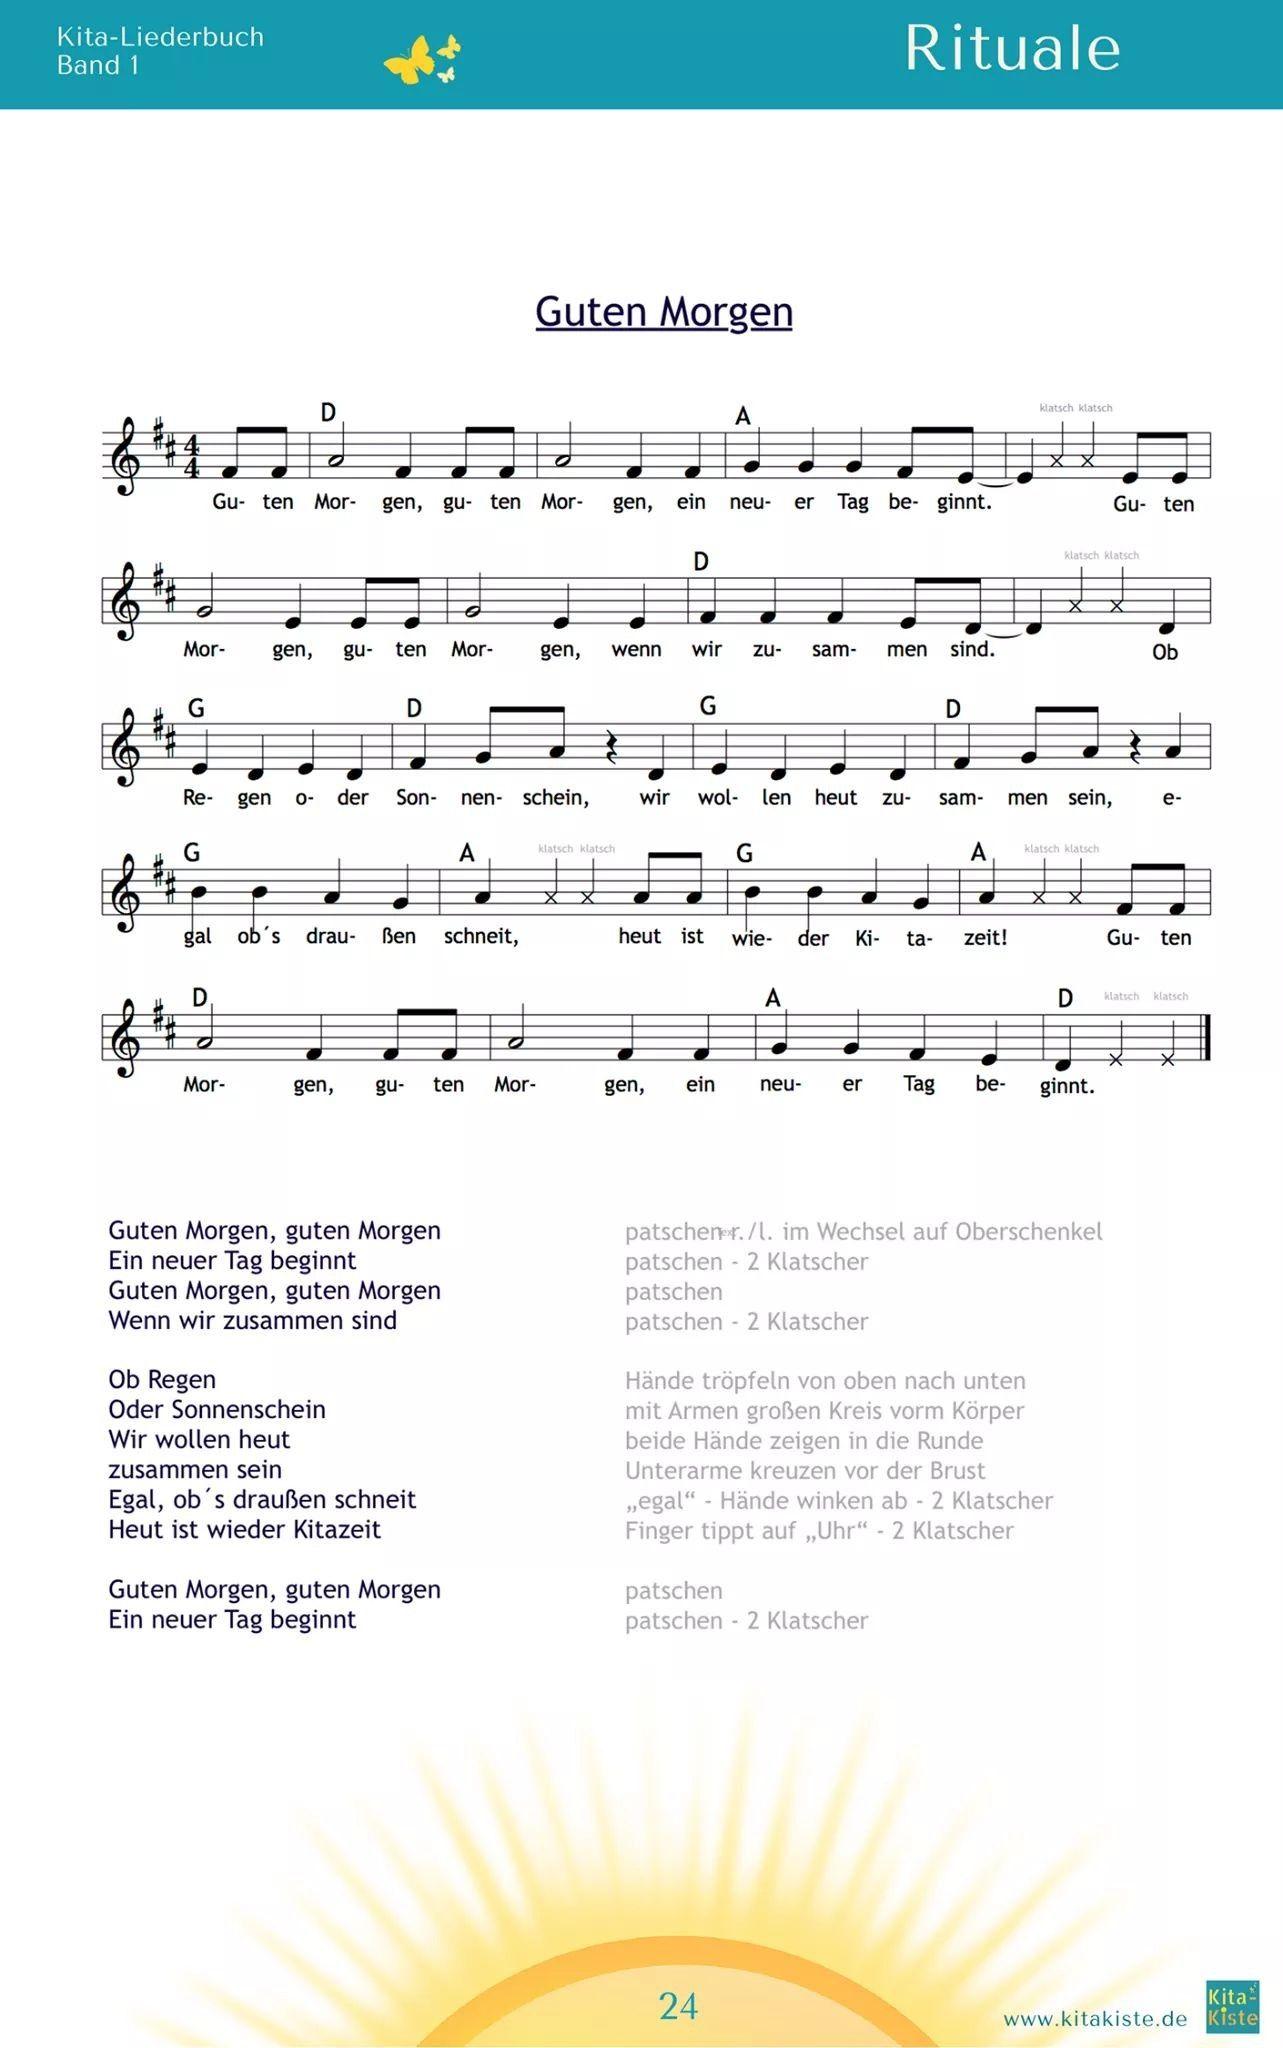 Lieder Rituale Lieder Begrüßungslied Kindergarten